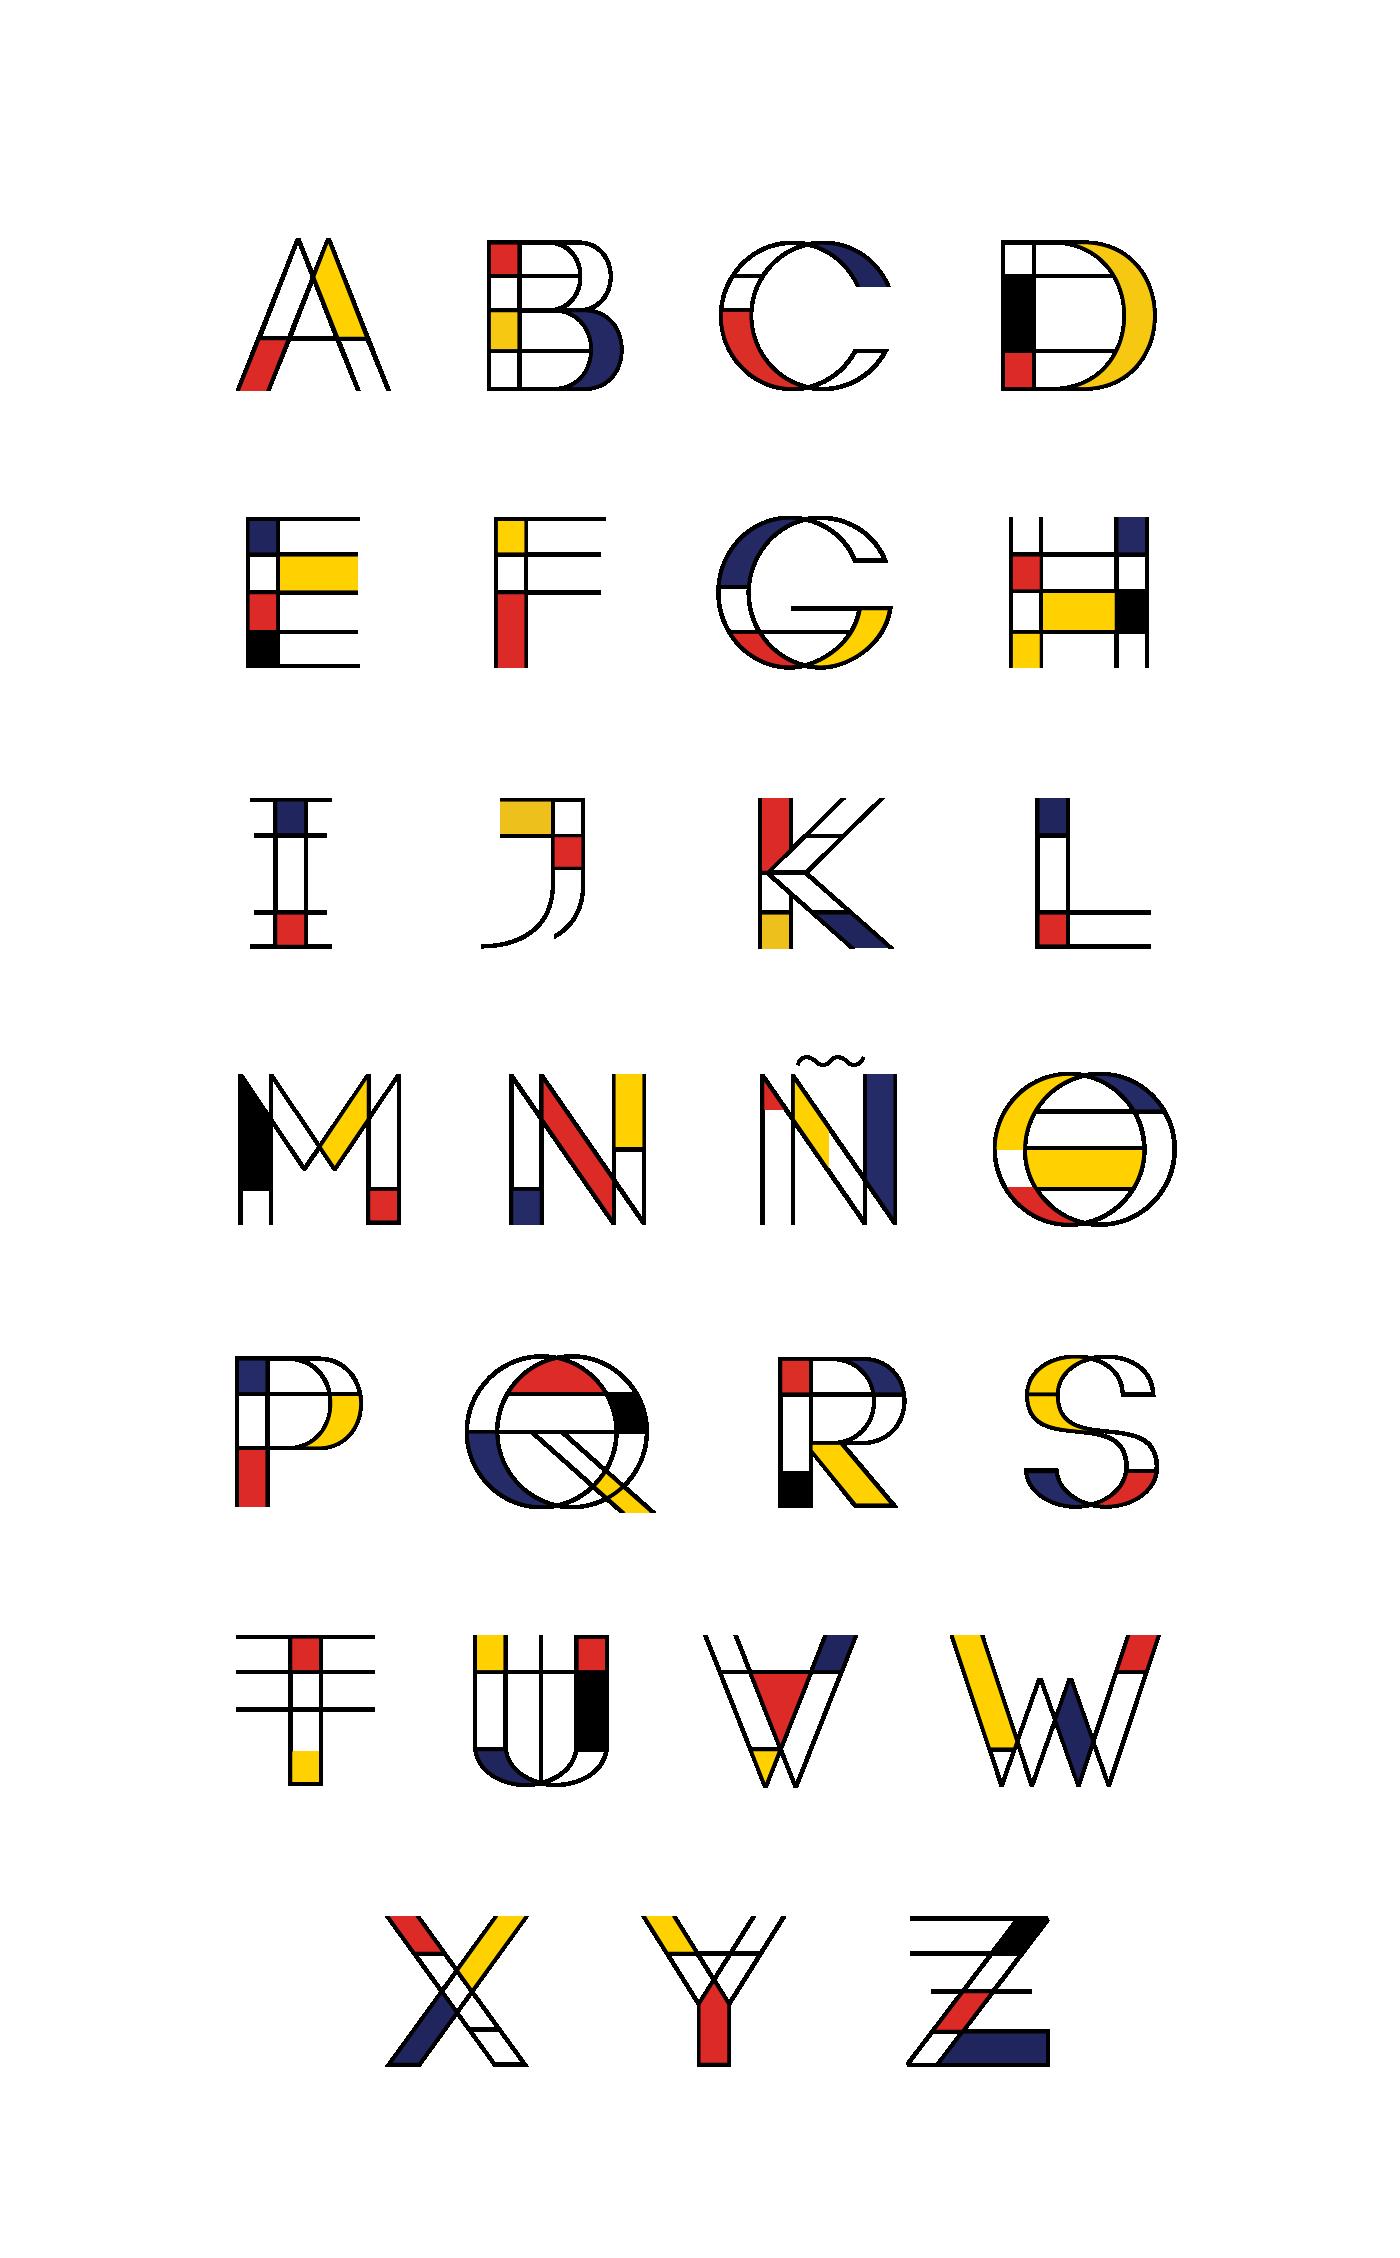 mondrian de stijl neoplasticism piet tano abstract primary